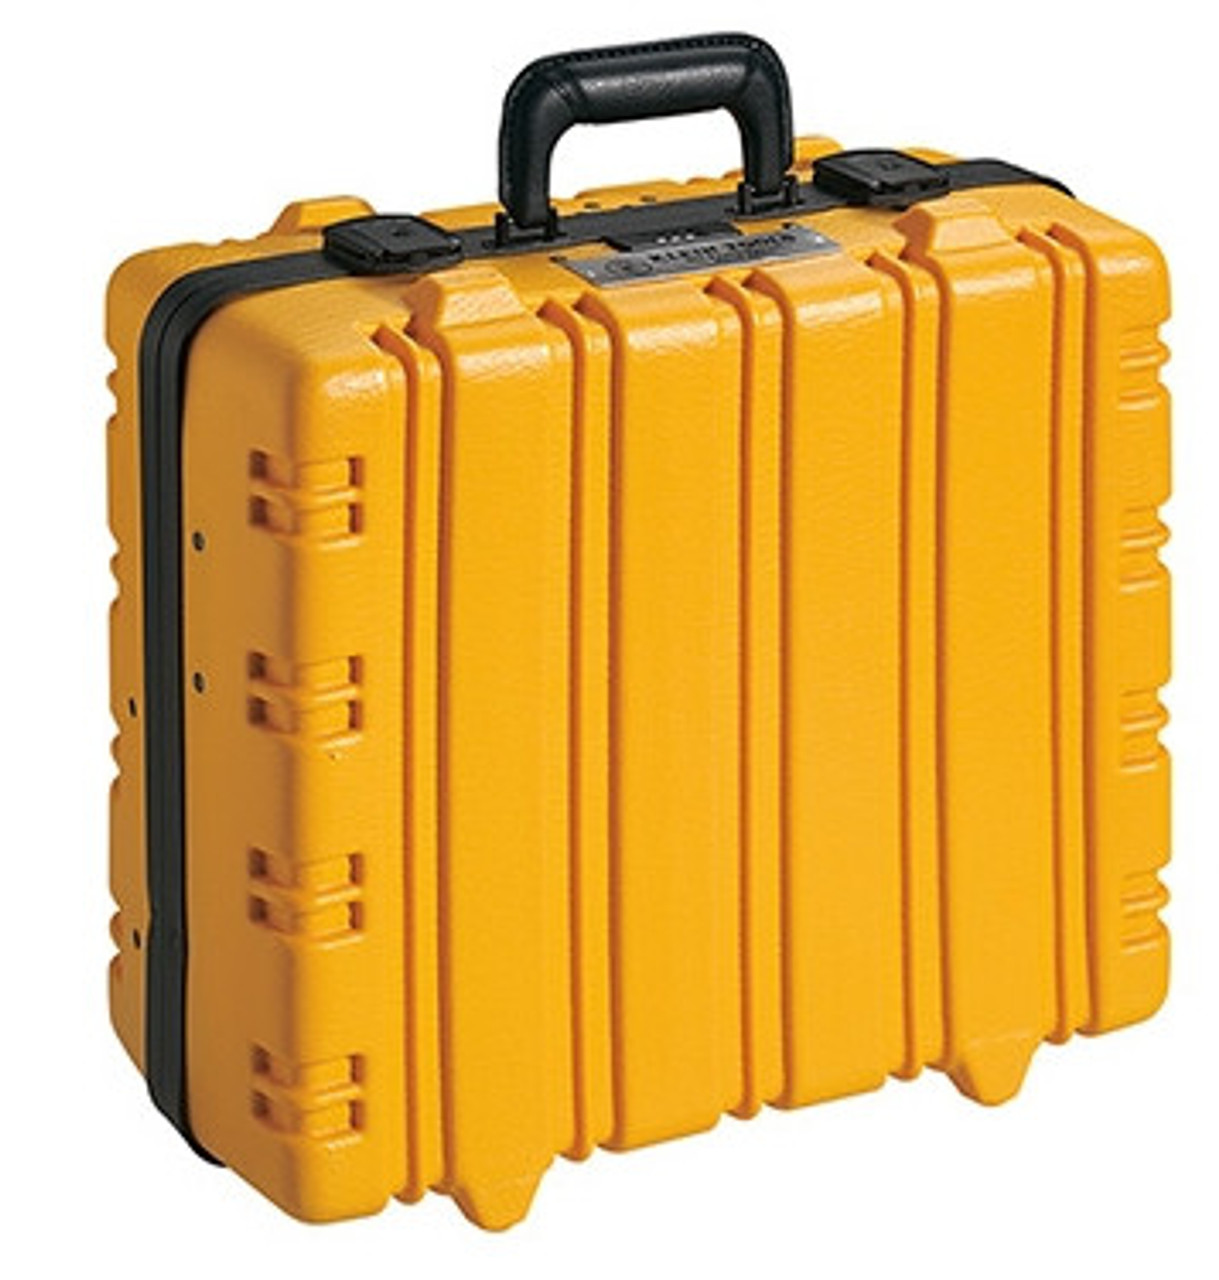 Klein 33537 Heavy Duty Case